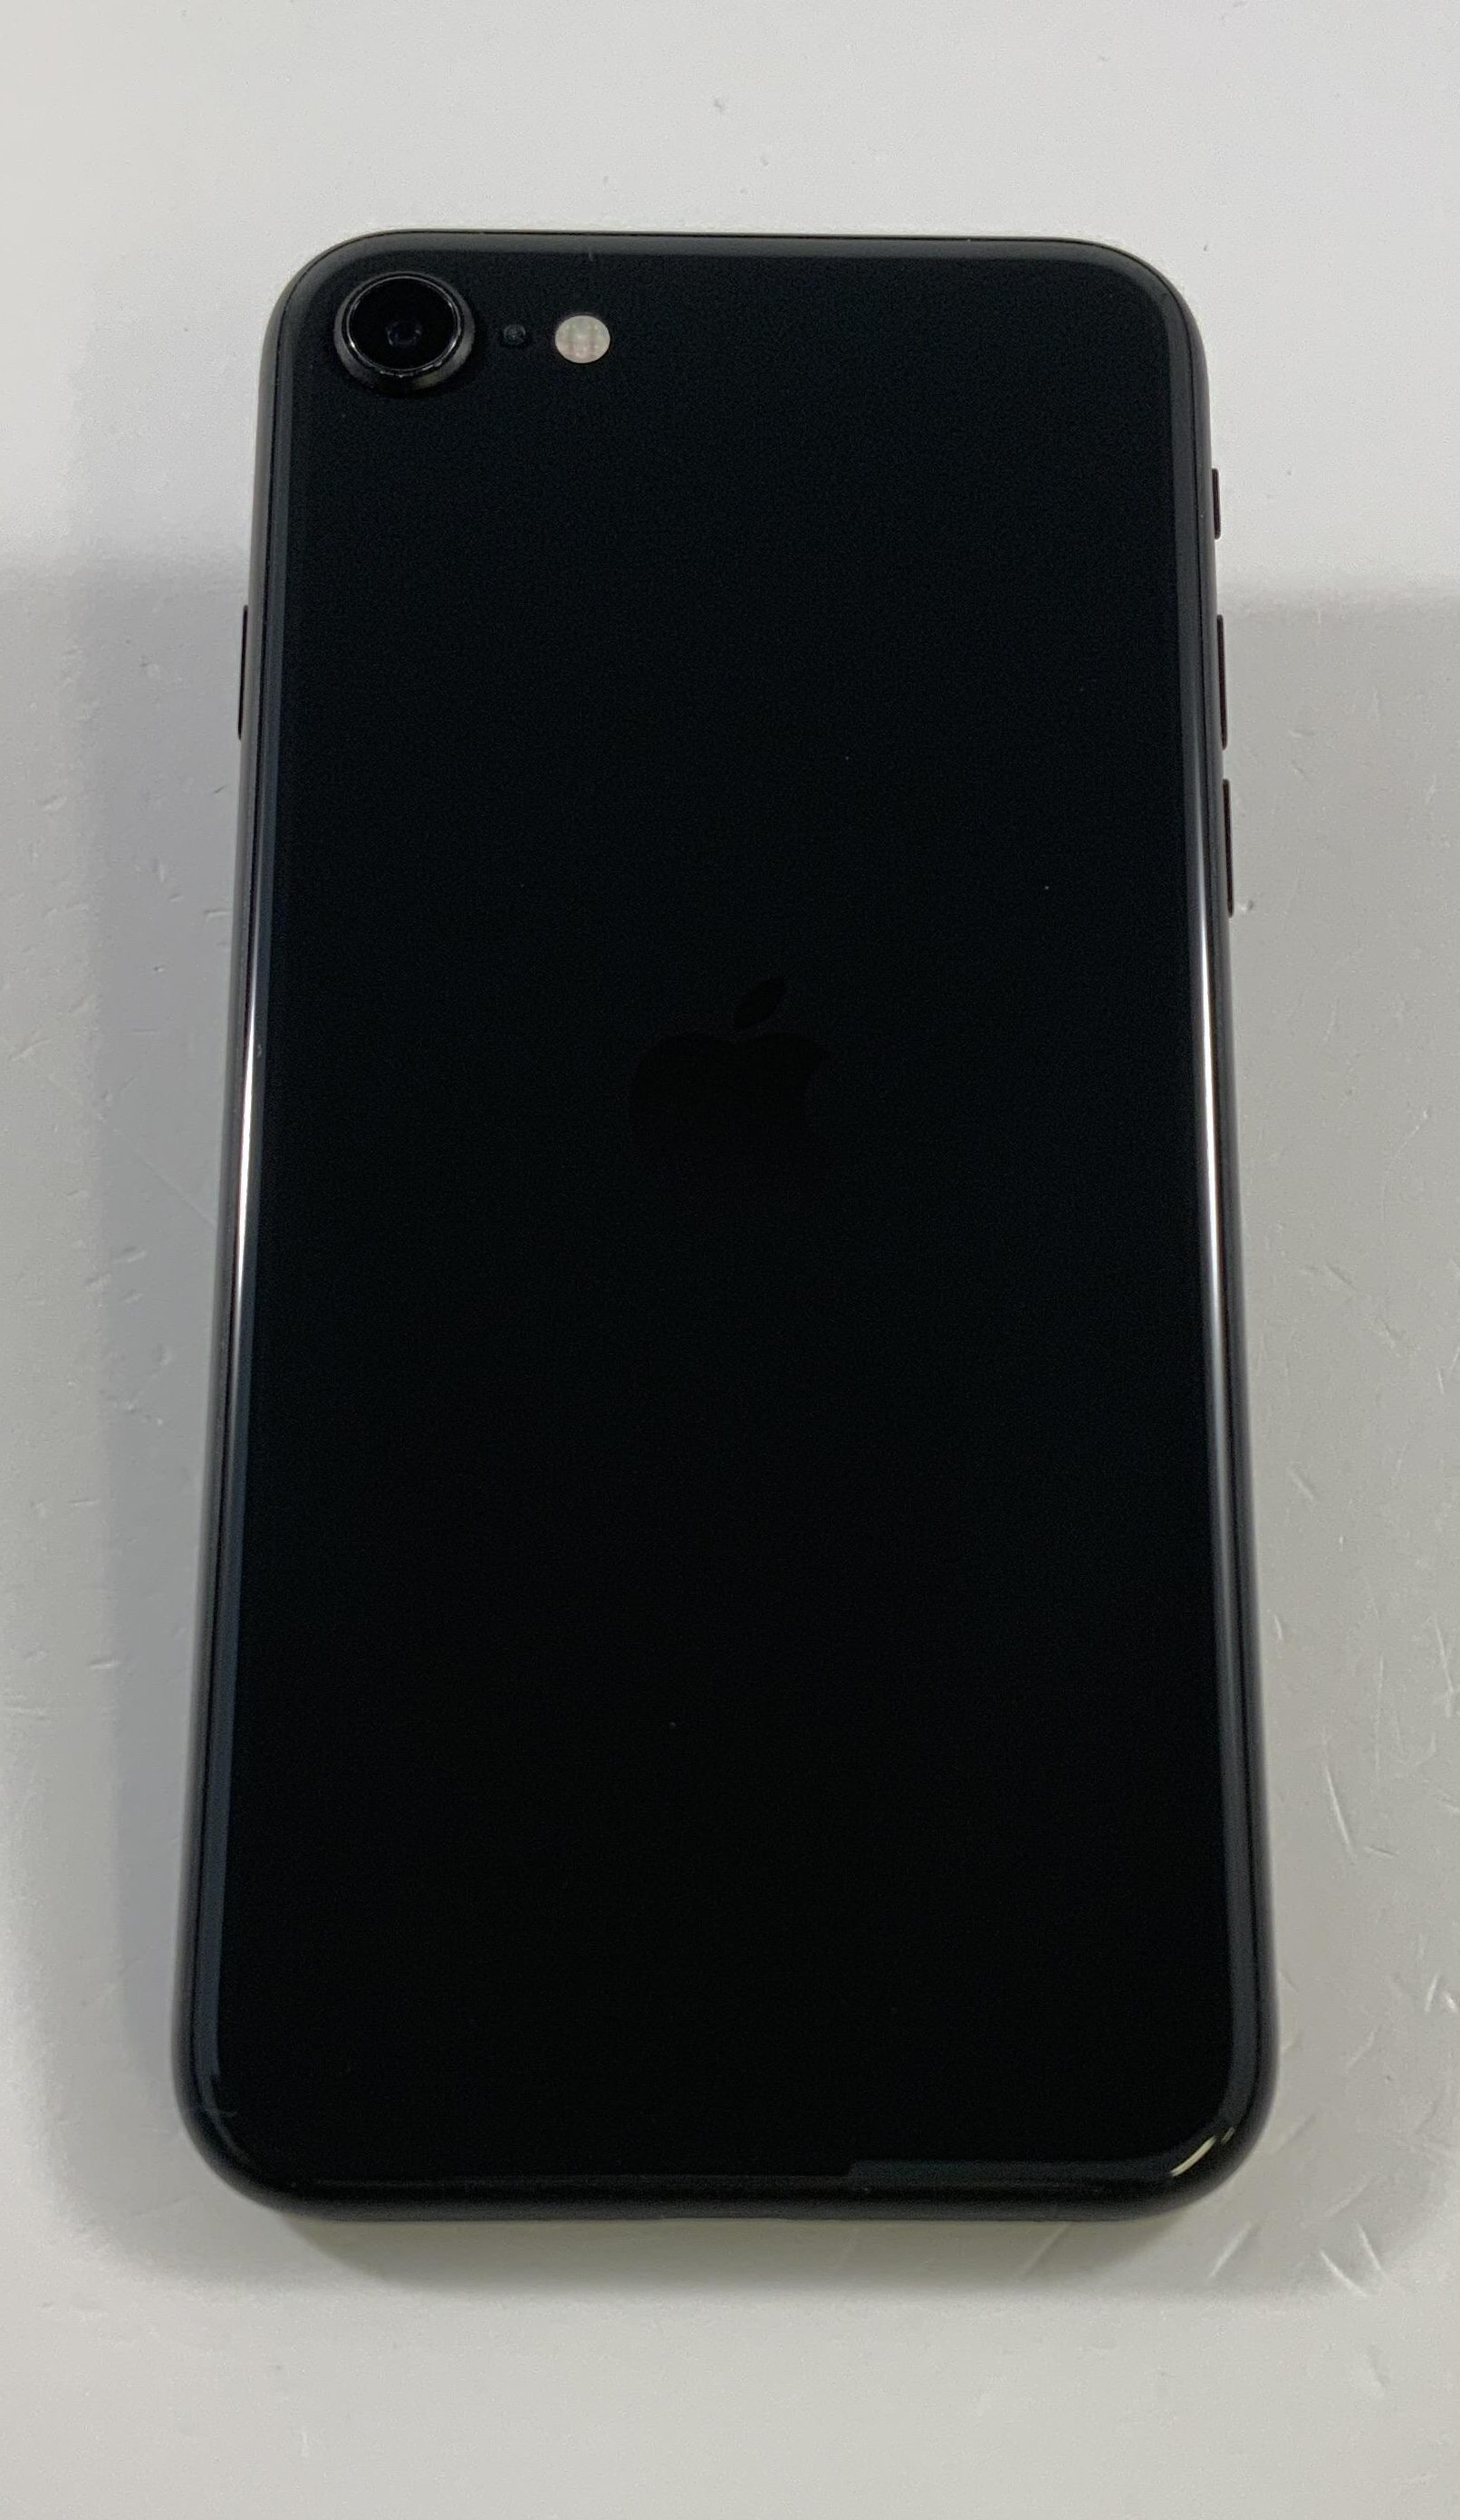 iPhone SE (2nd Gen) 128GB, 128GB, Black, imagen 2